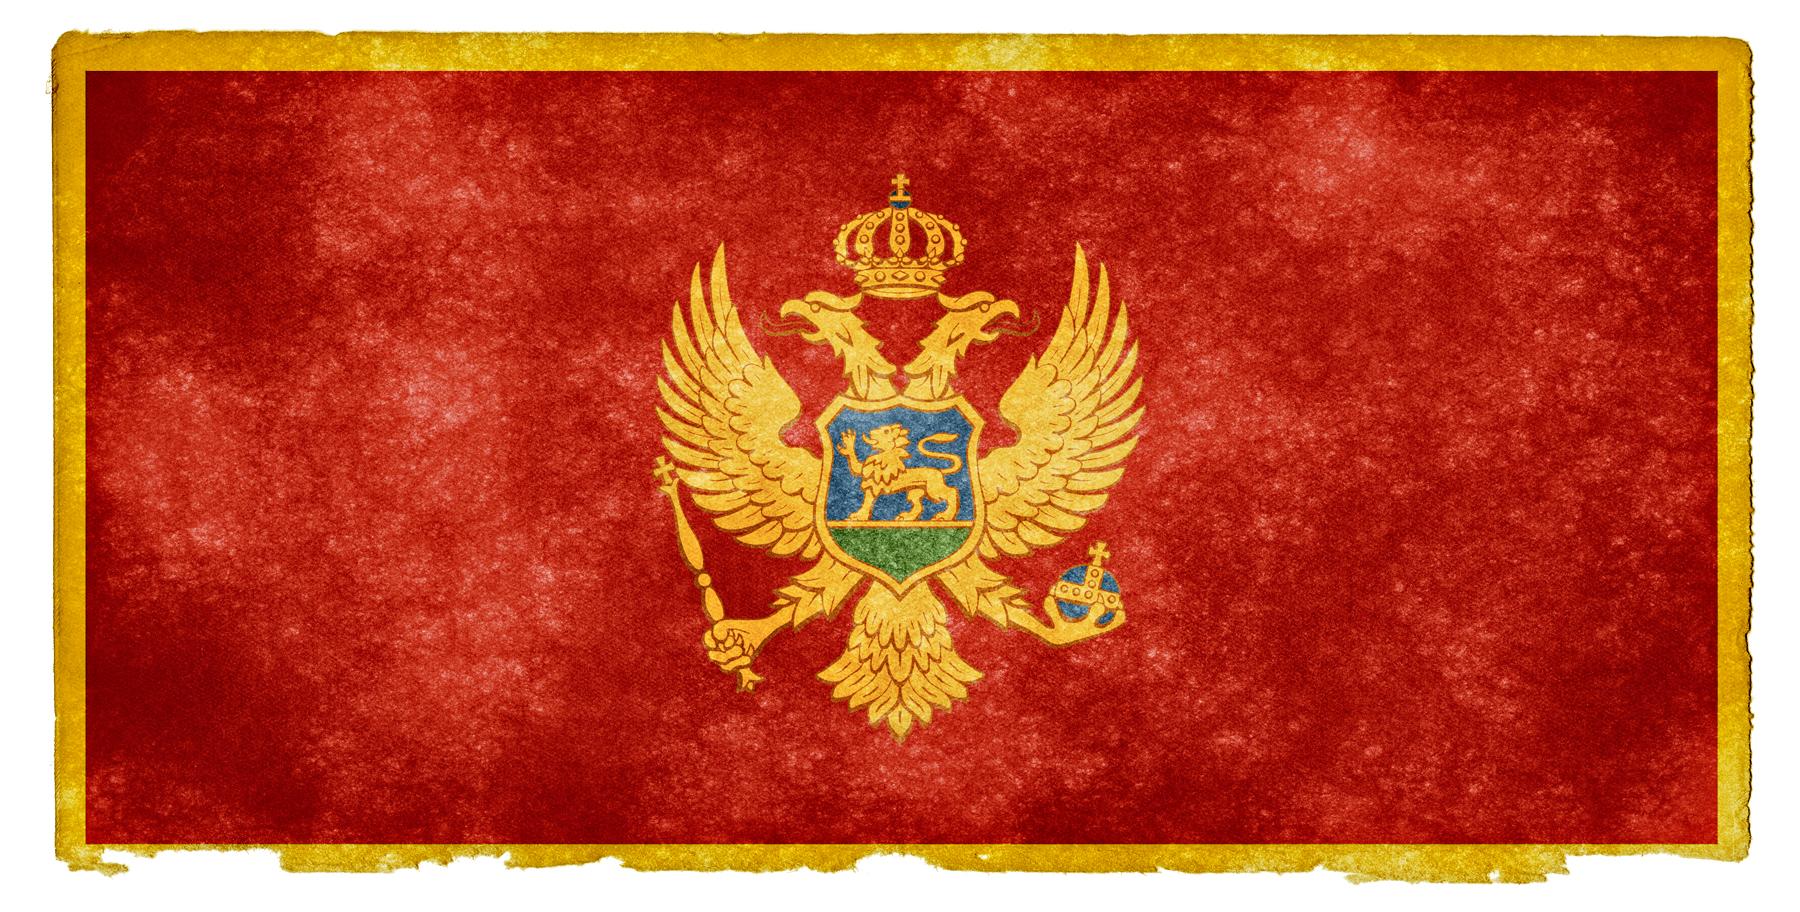 Montenegro Grunge Flag, Aged, Pride, Isolated, Montenegro, HQ Photo